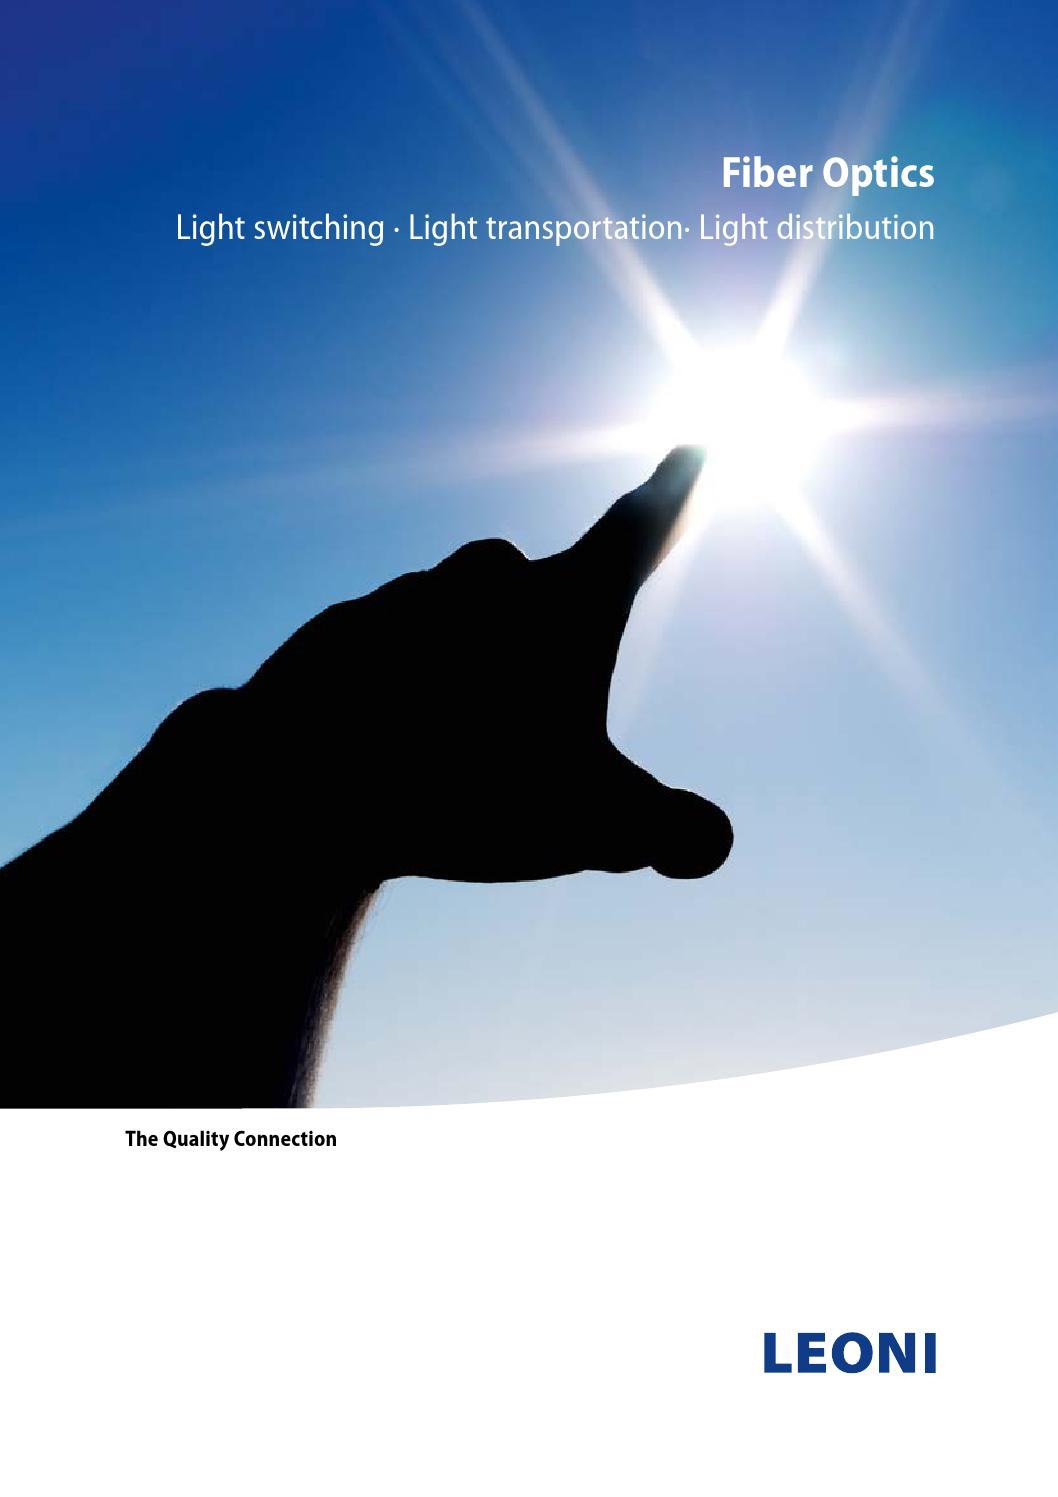 Leoni Fiber Optics 2015 by Calpe Industrial Products - issuu